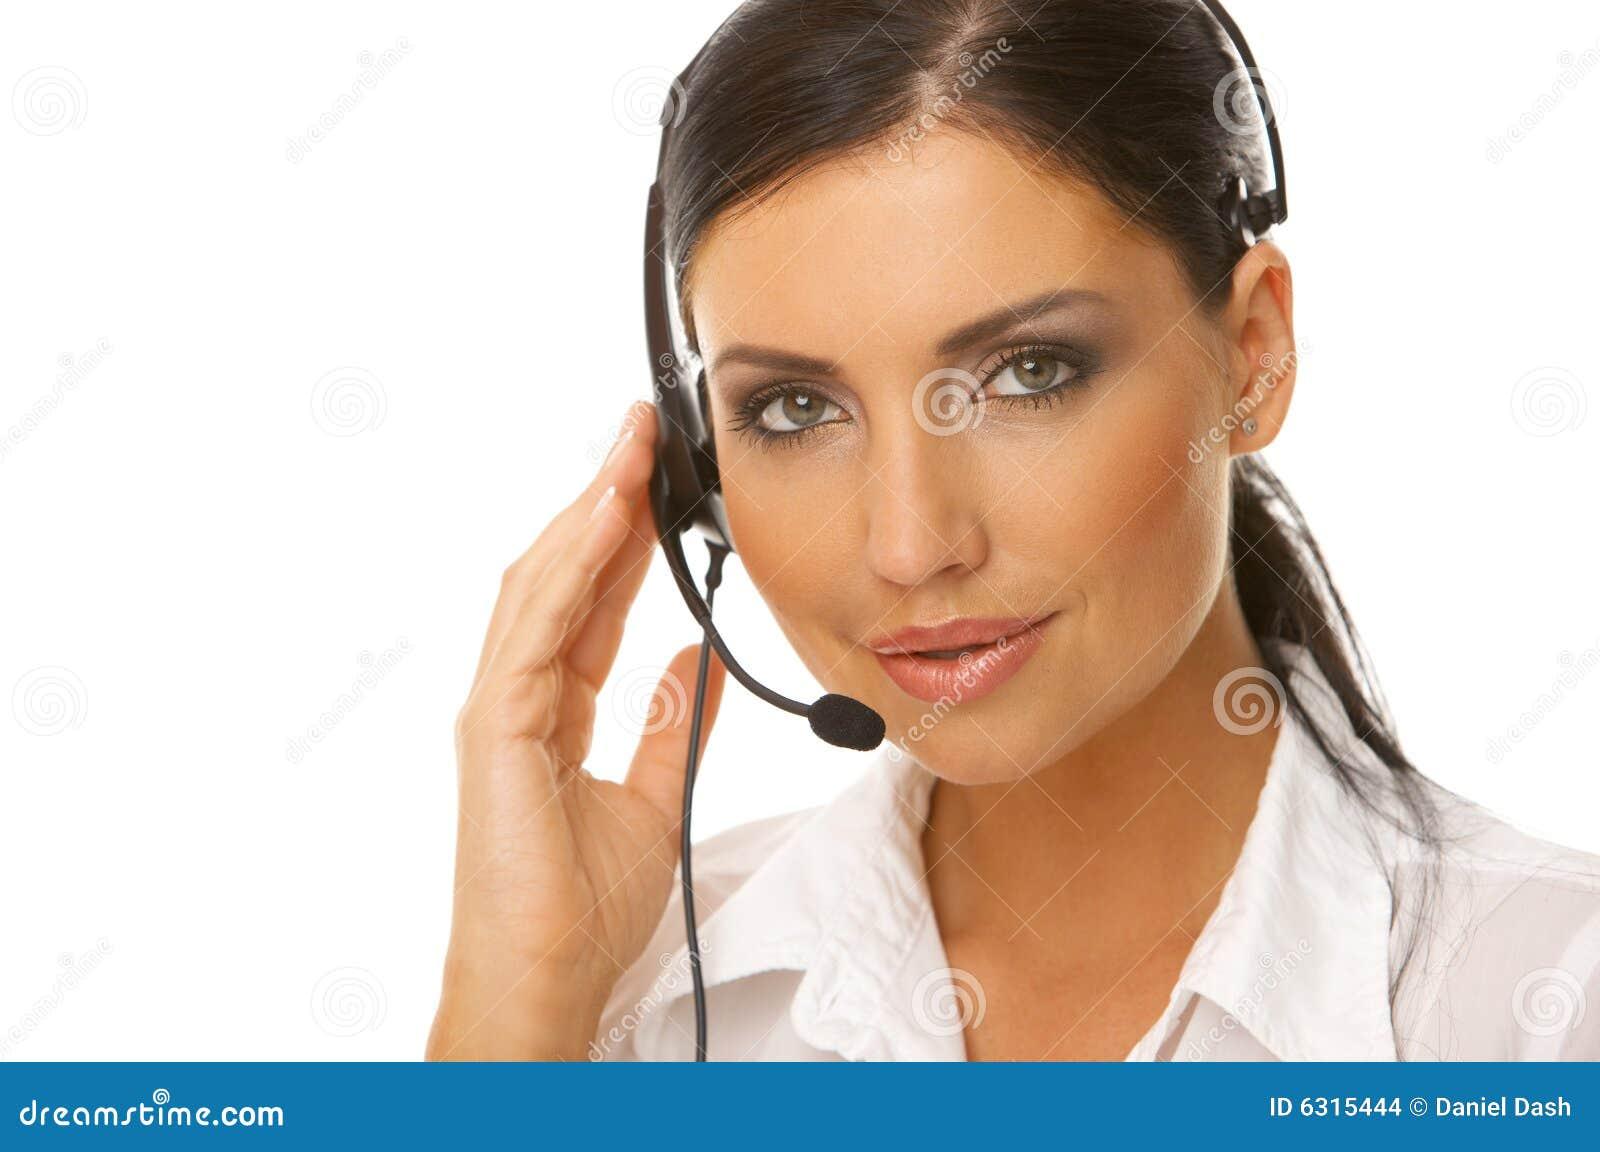 Secretary online